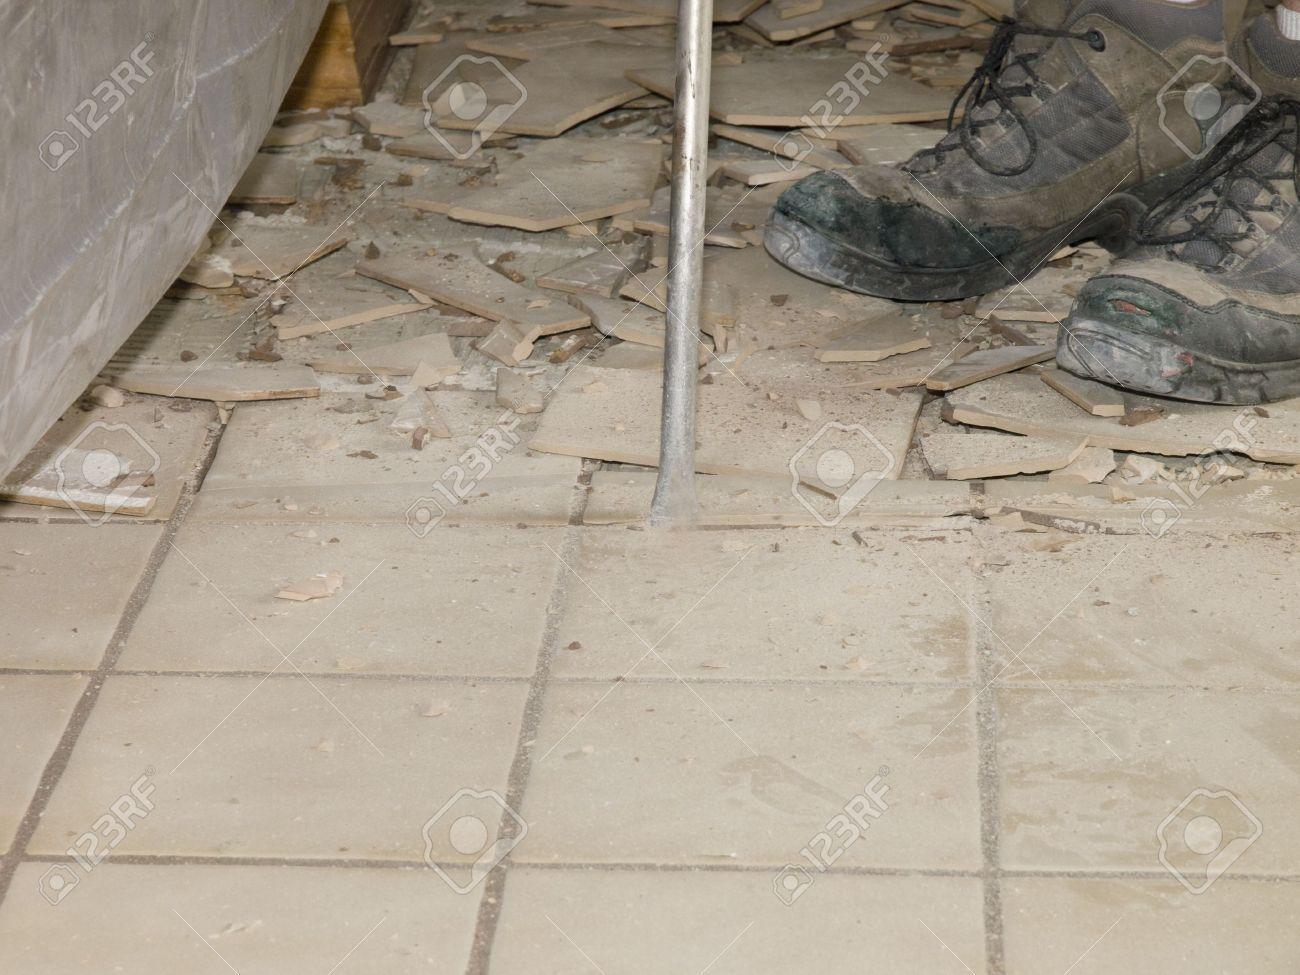 Ceramic tile floor demolition nextsoft pinterest